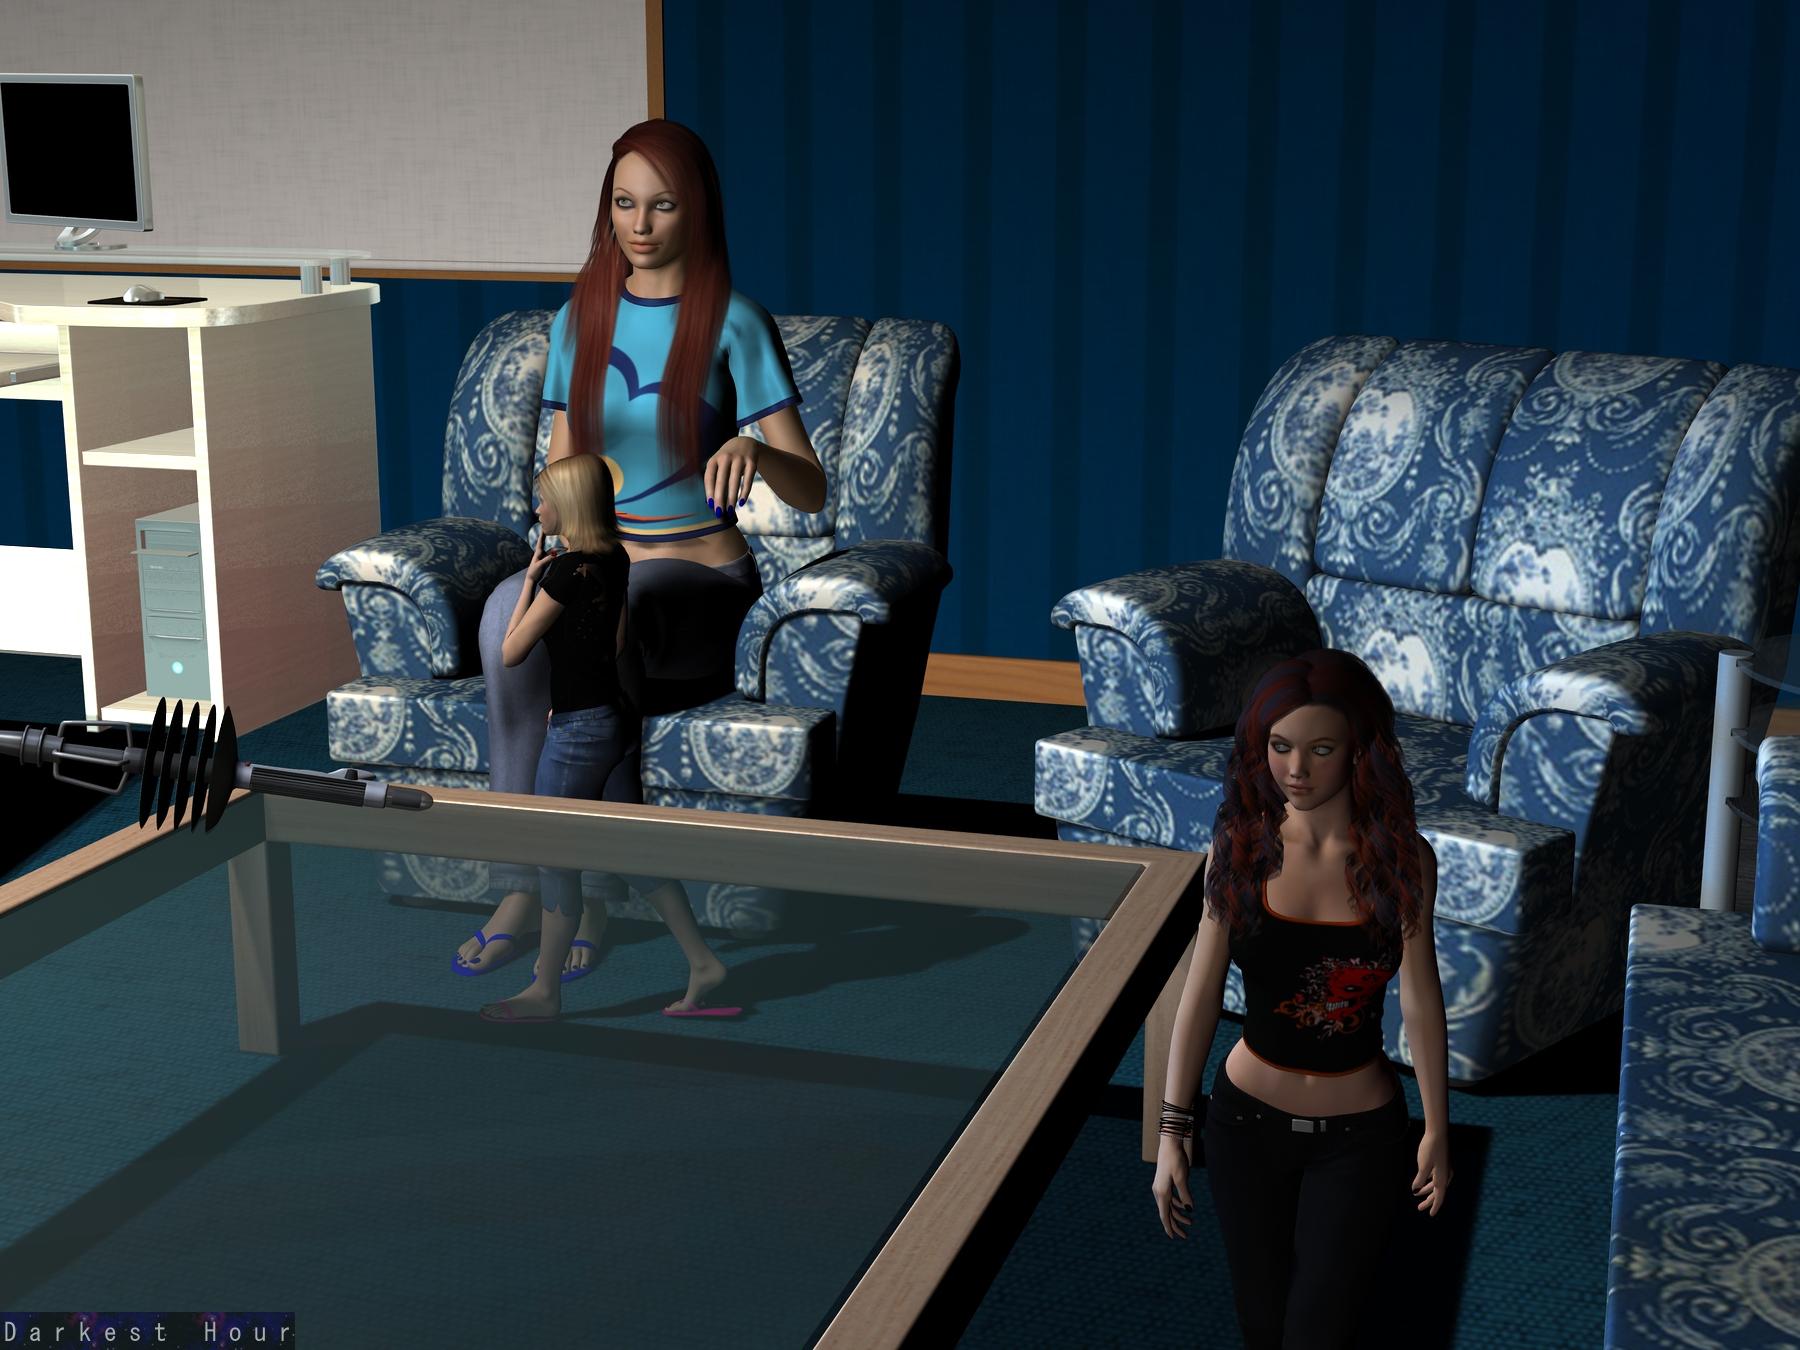 Shrink Games 19 By Darkesthour55 On Deviantart